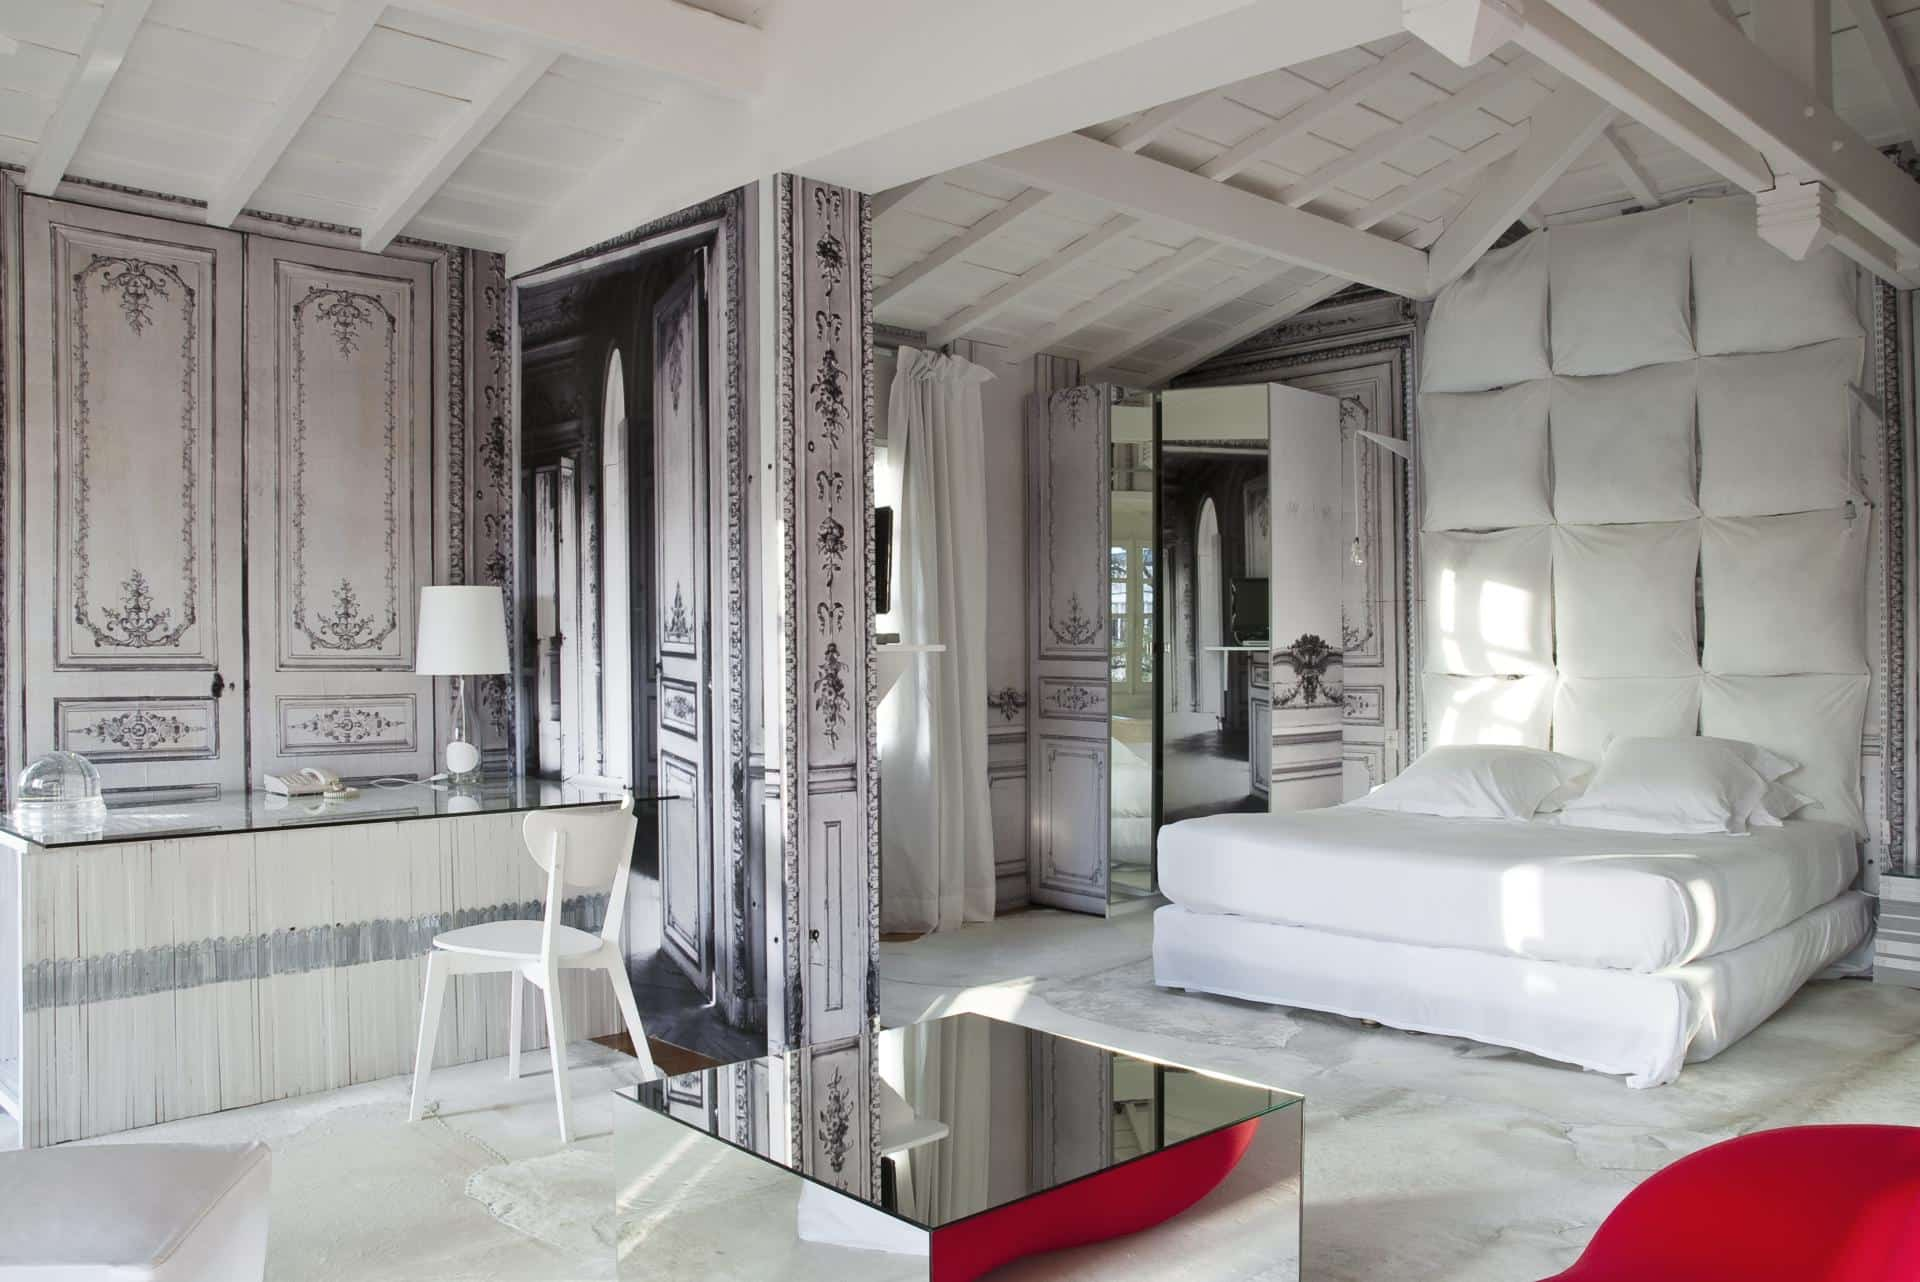 Gray and white minimalistic boudoir